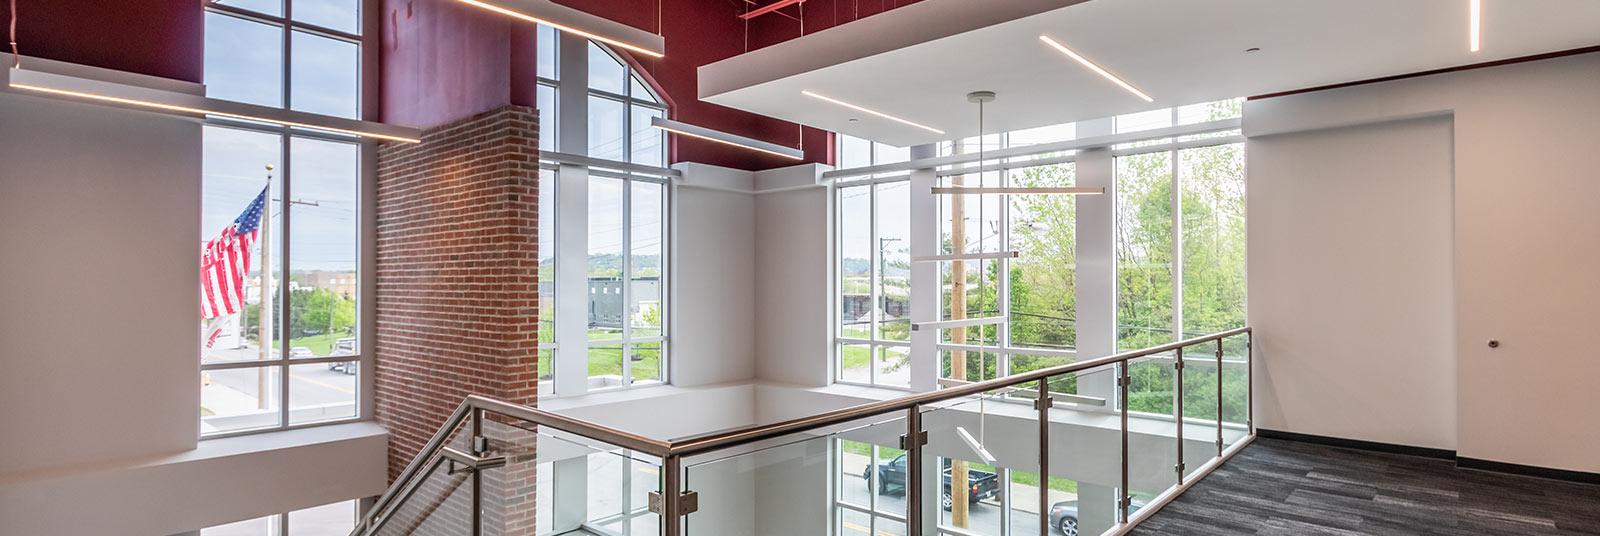 Second floor view of the lobby atrium inside the Nehemiah Manufacturing facility in Cincinnati, Ohio.